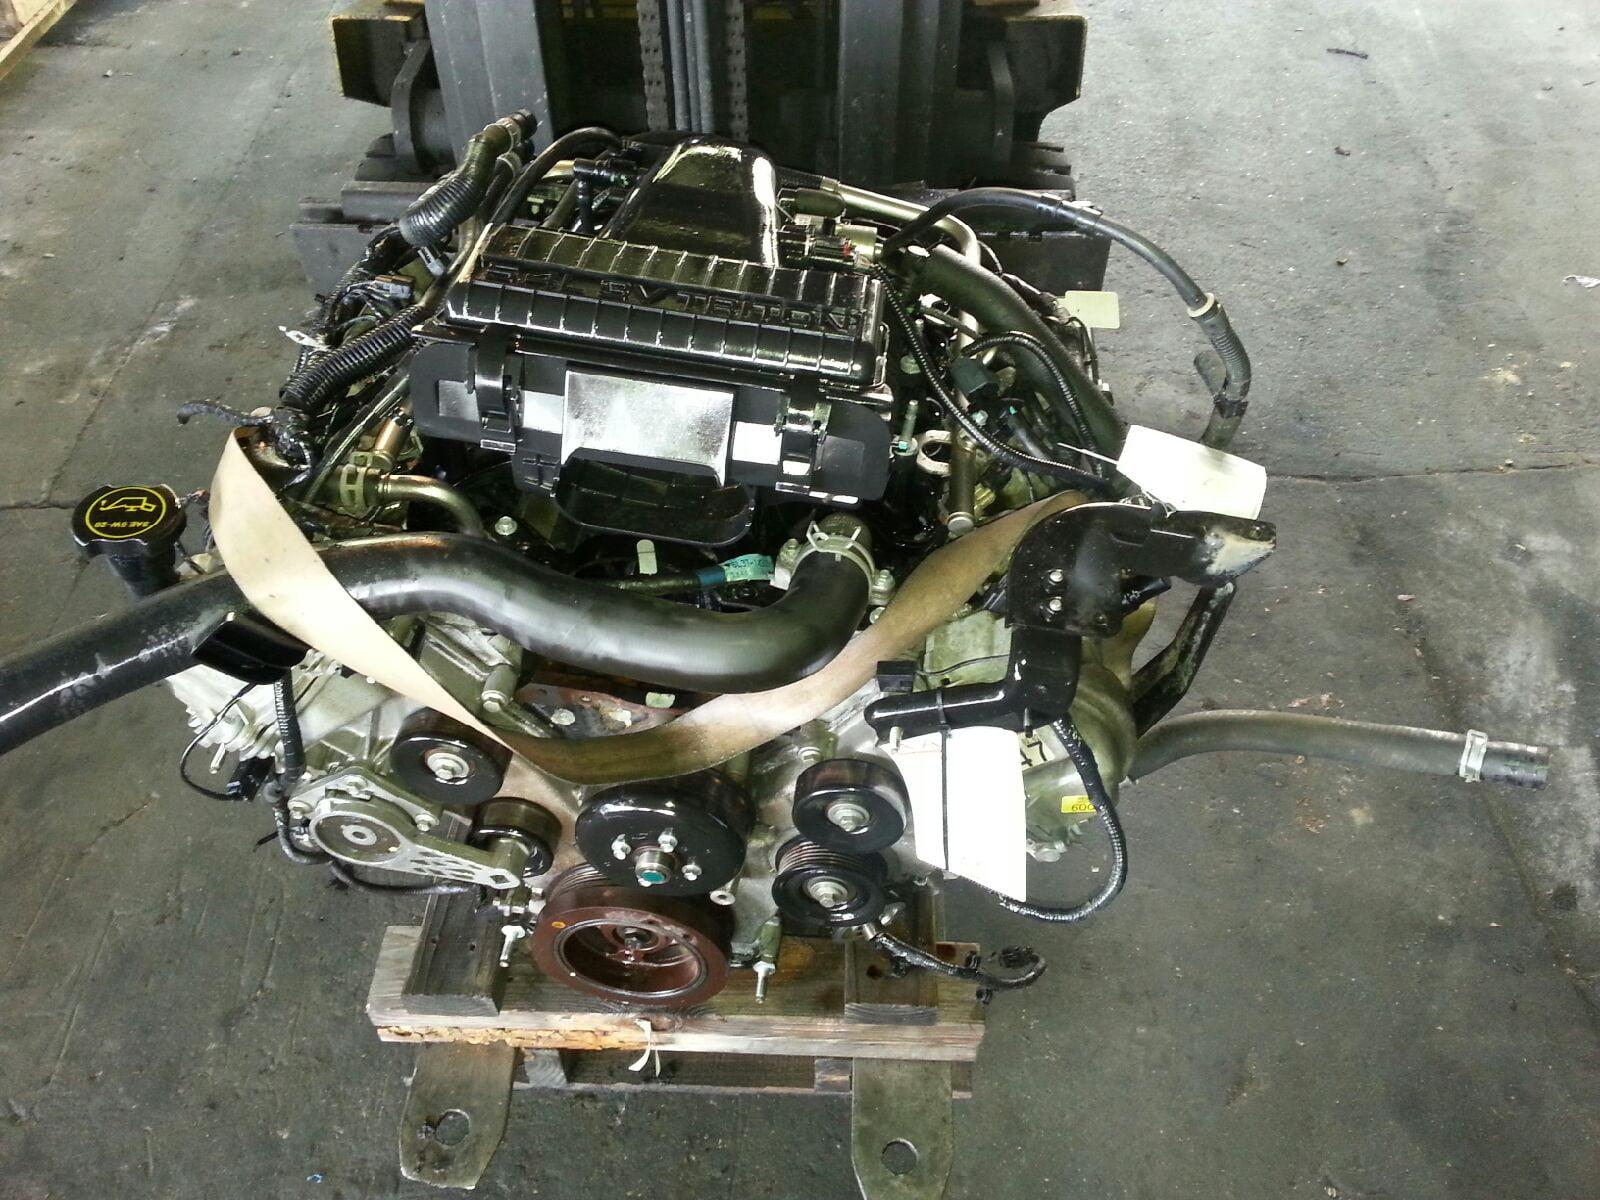 2007 5 4 Triton Engine Diagram | Wiring Diagram 2019